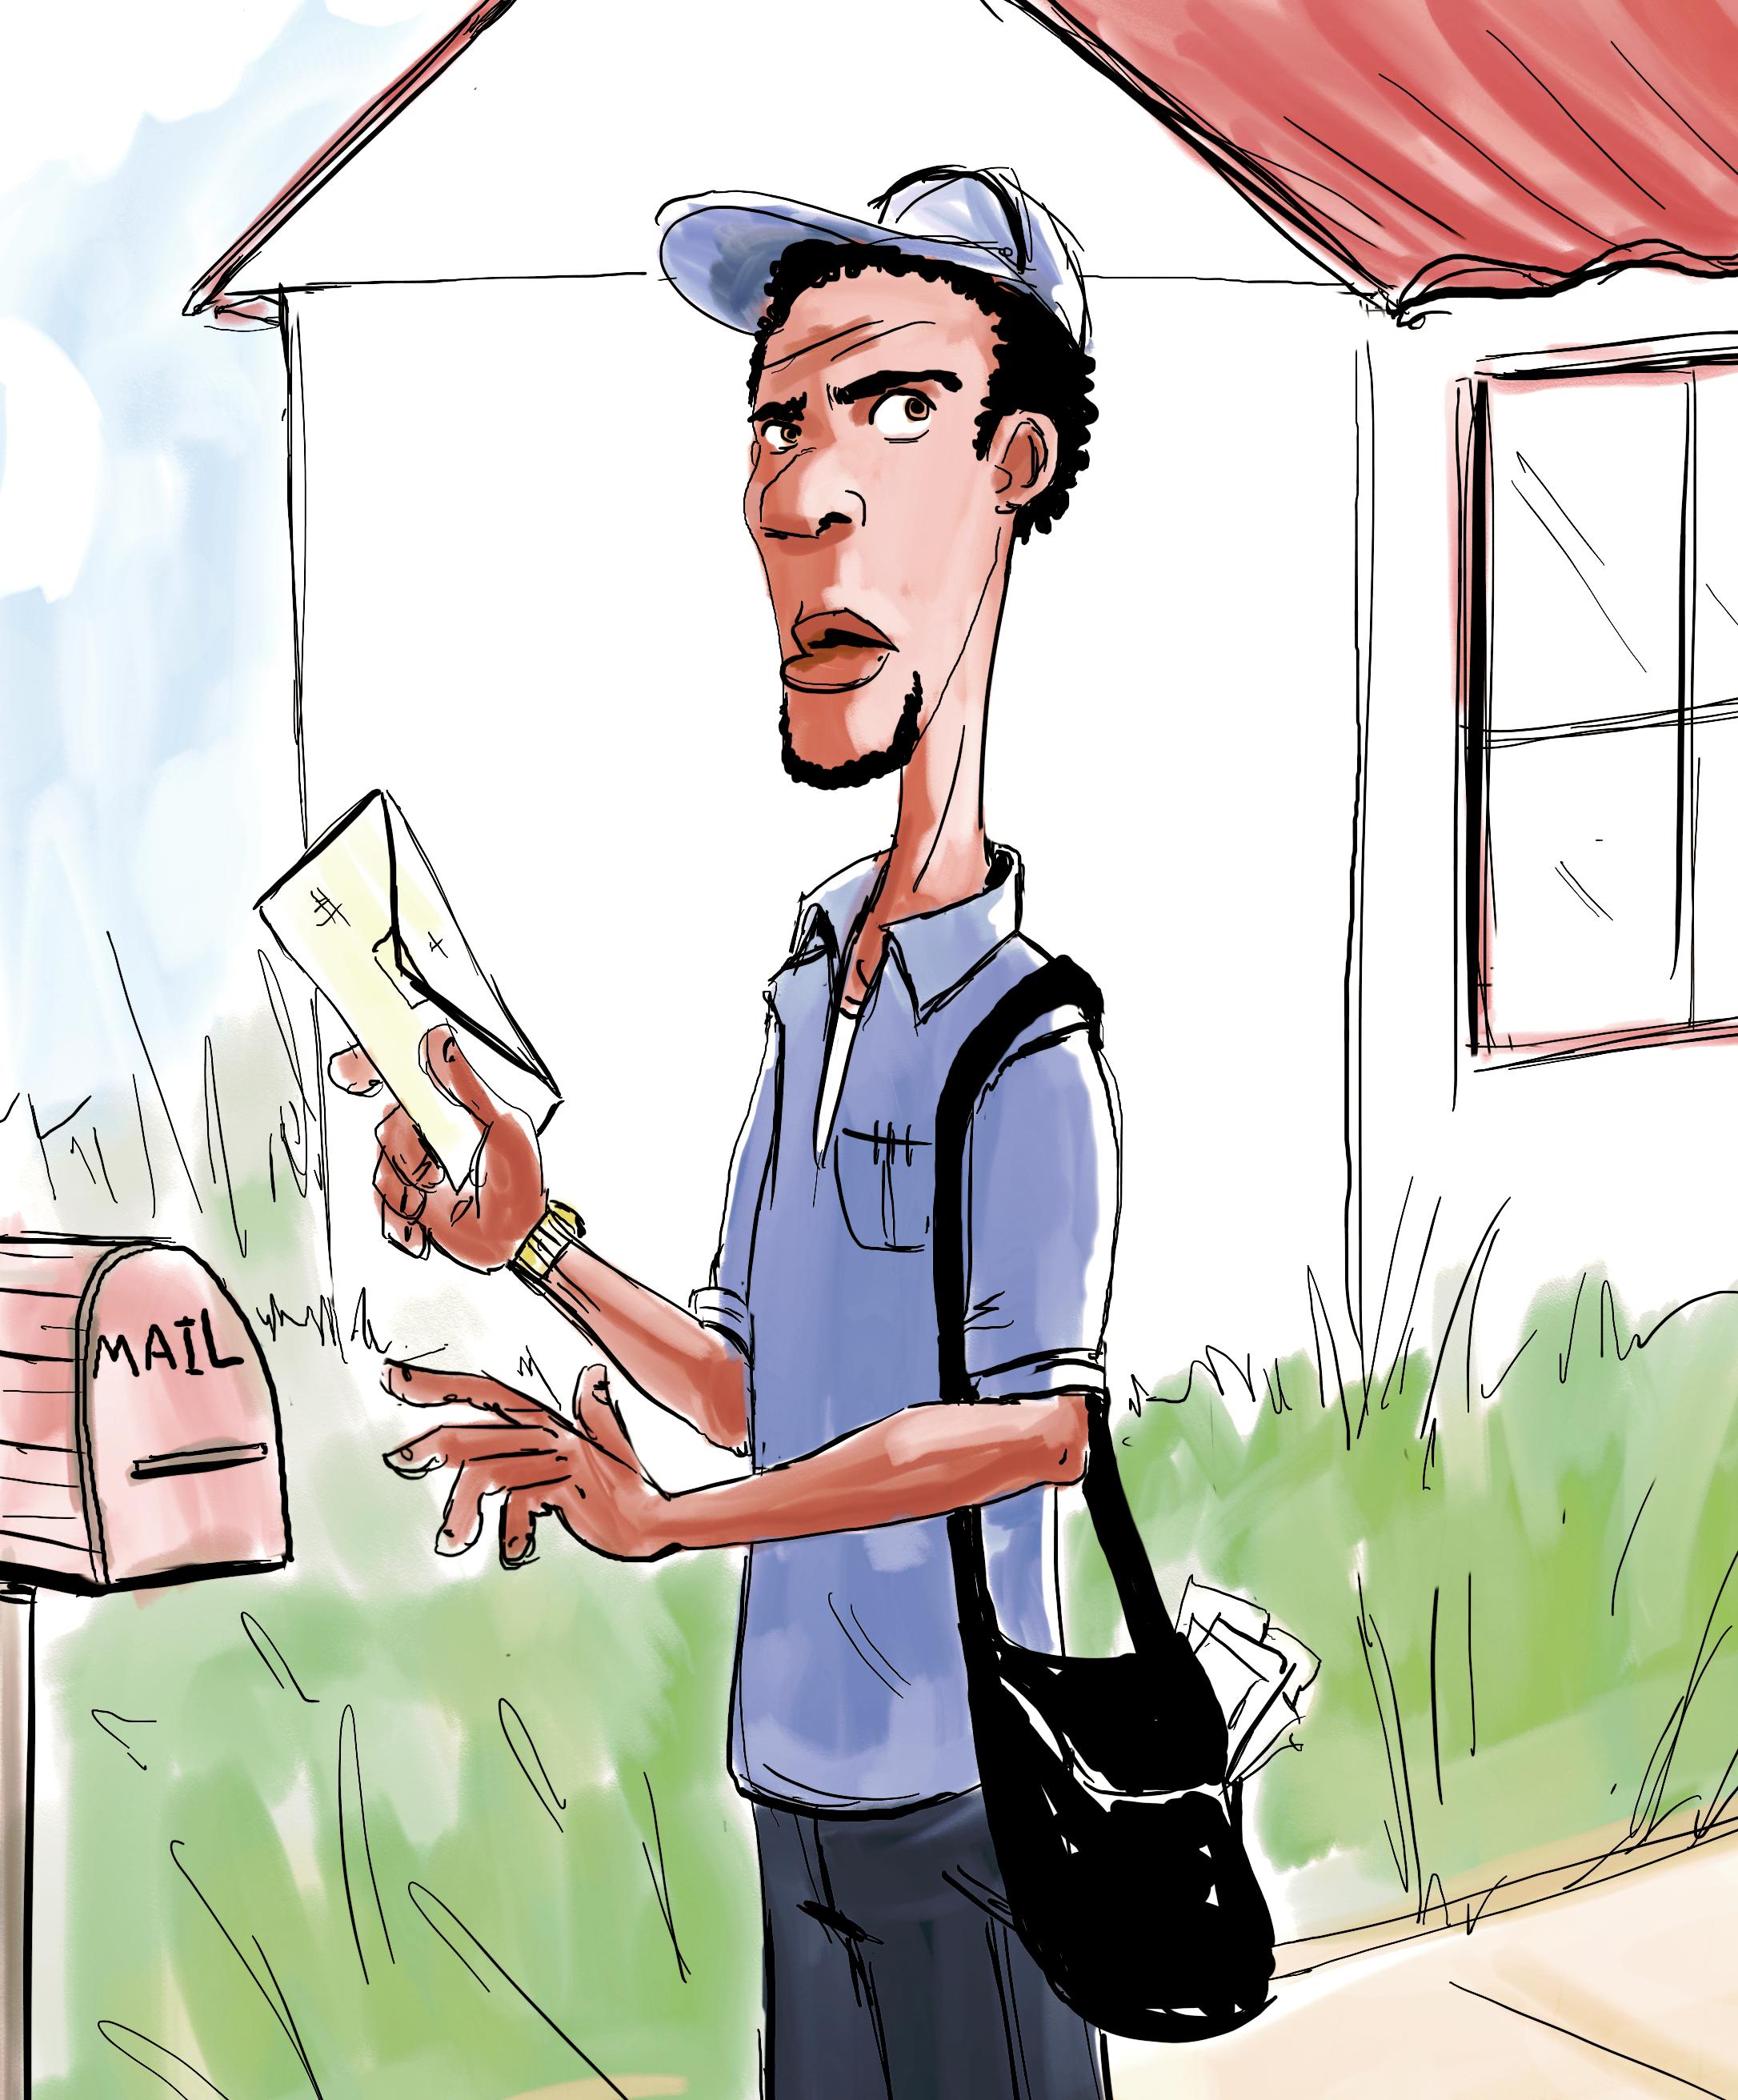 Island Postman